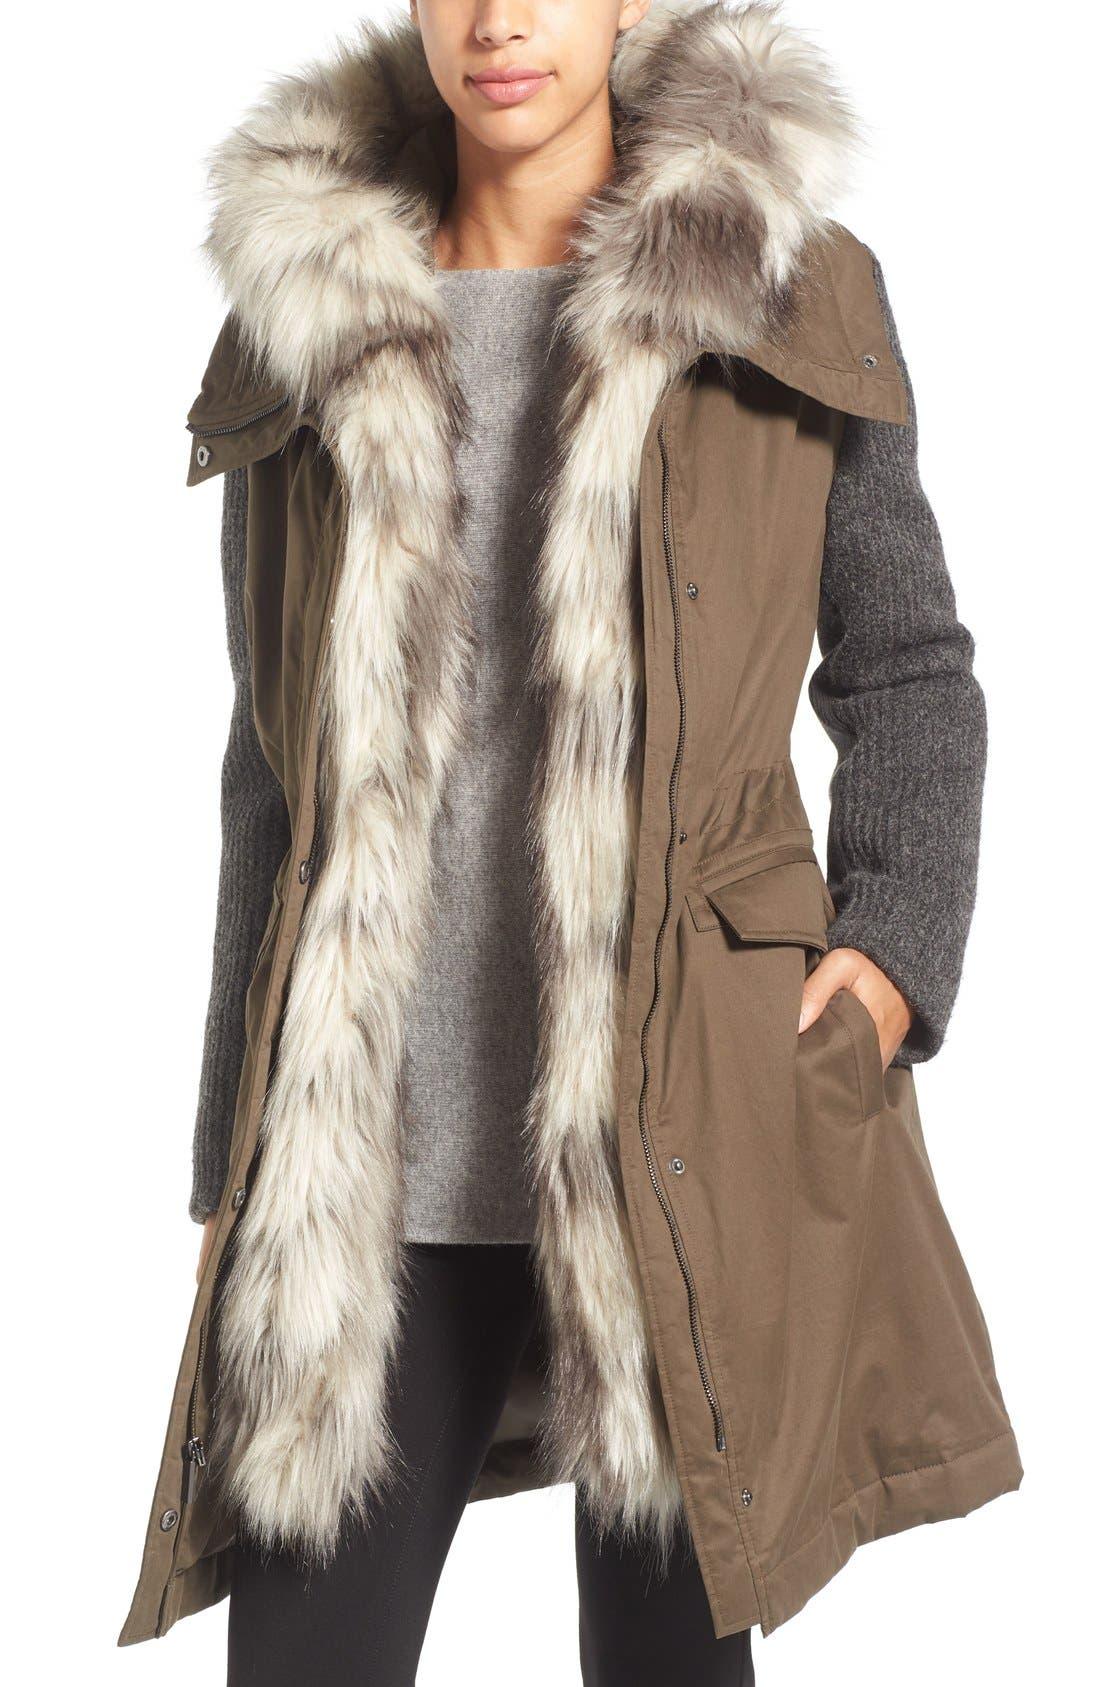 Alternate Image 1 Selected - Vera Wang Faux Fur Trim Mixed Media Parka